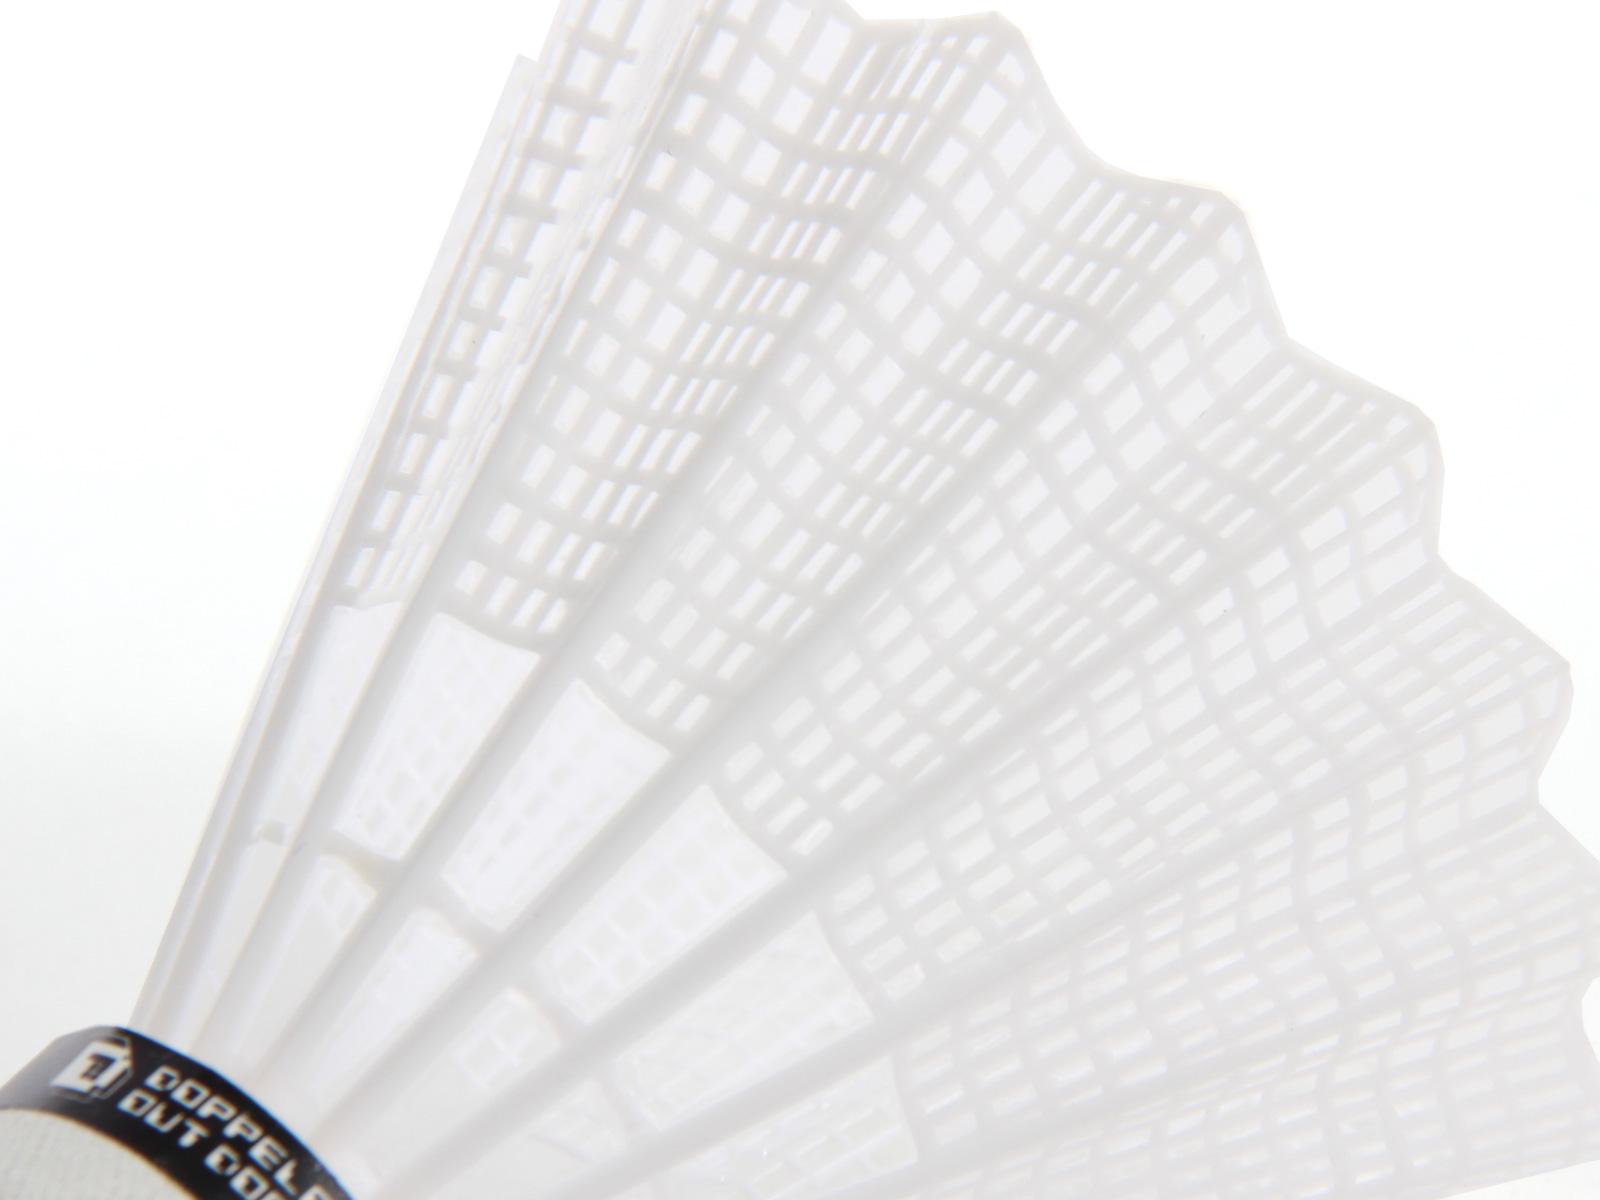 LEDバドミントンシャトルの各部の特徴(ナイロン製)